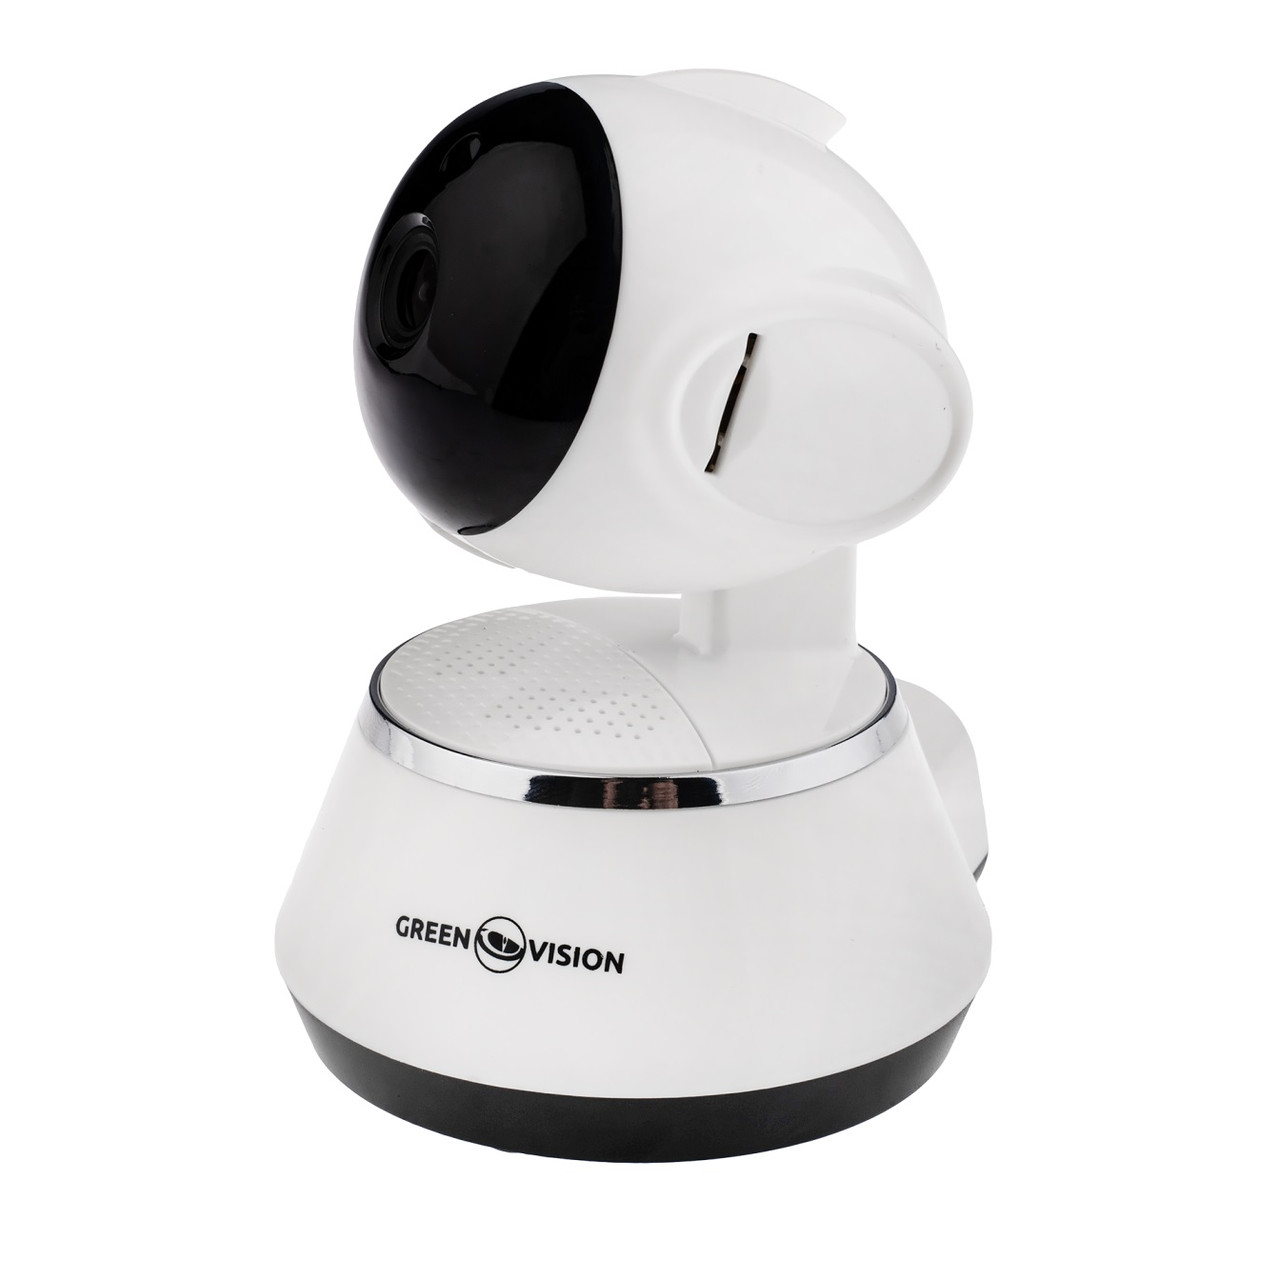 IP камера GreenVision GV-087-GM-DIG10-10 PTZ 720p (LP7810)